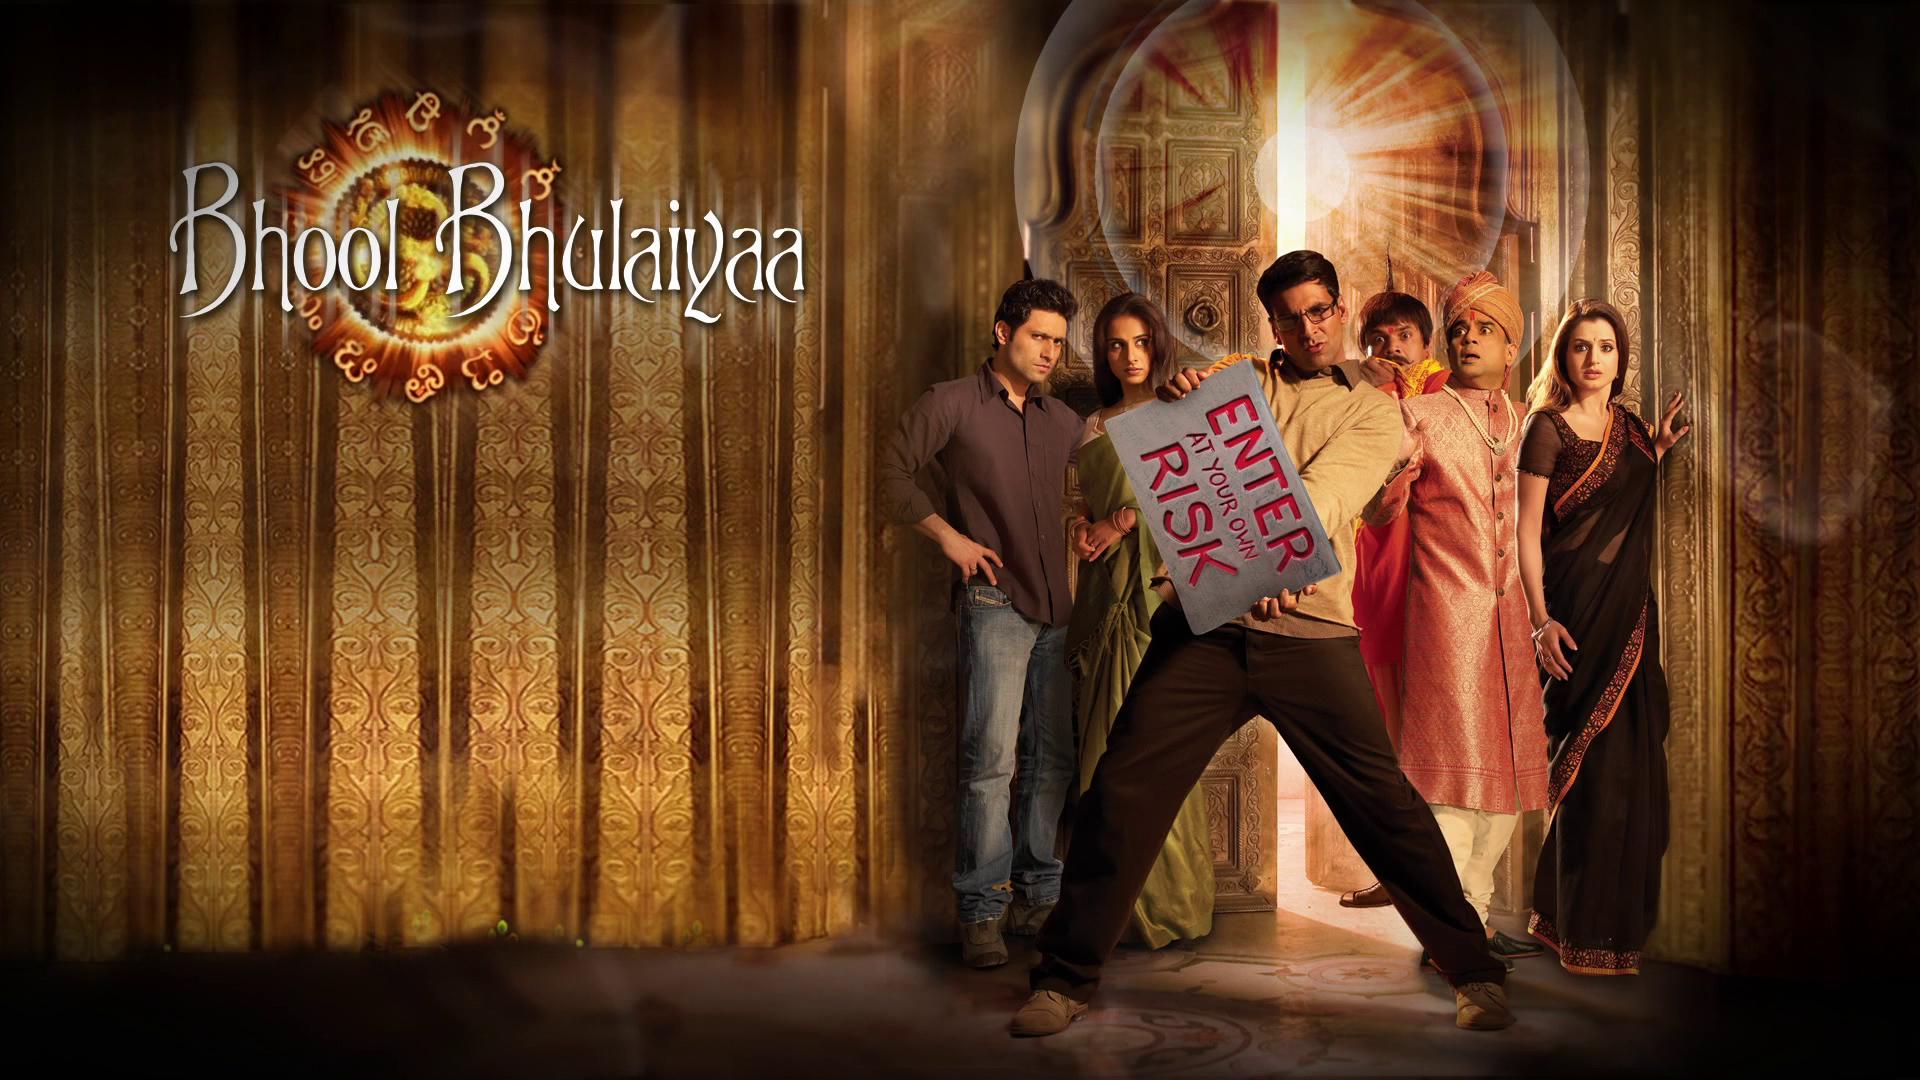 Bhool Bhulaiyaa 2007 Hindi Akshay Kumar & Vidhya Balan